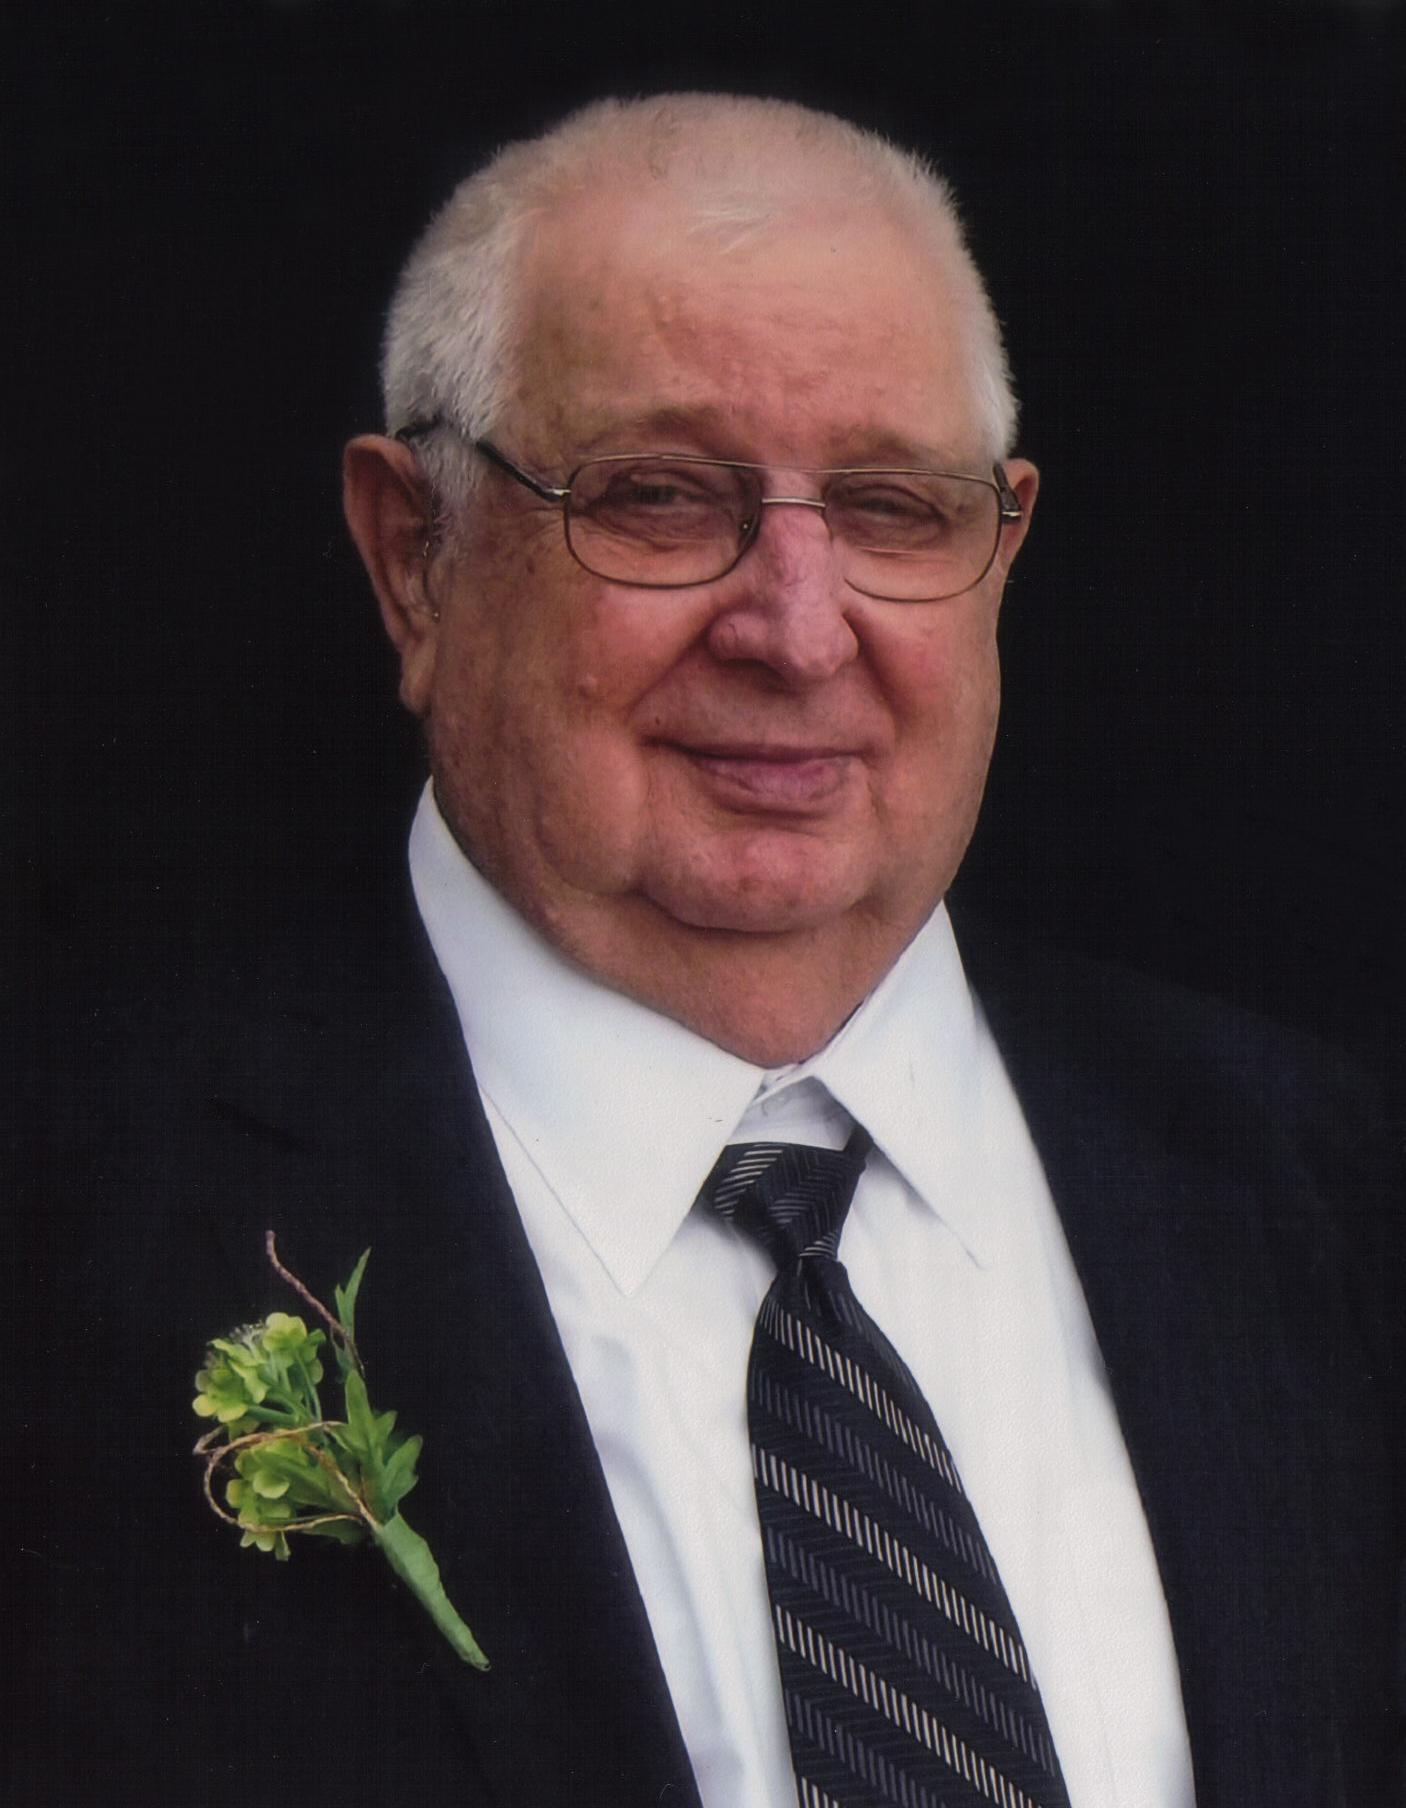 Donald R. Walk